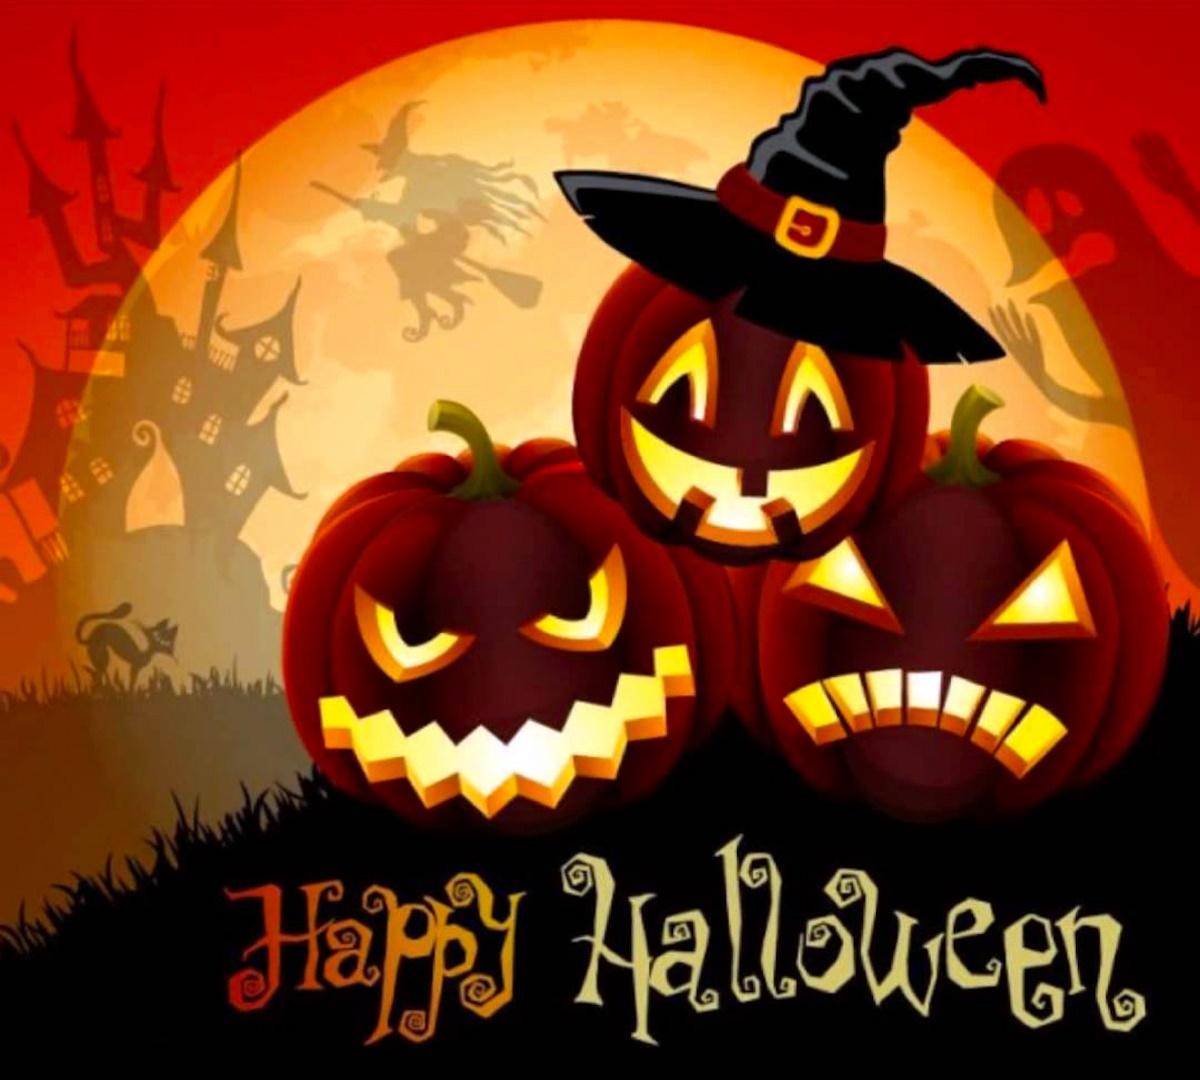 00 happy halloween 04. 31.10.14